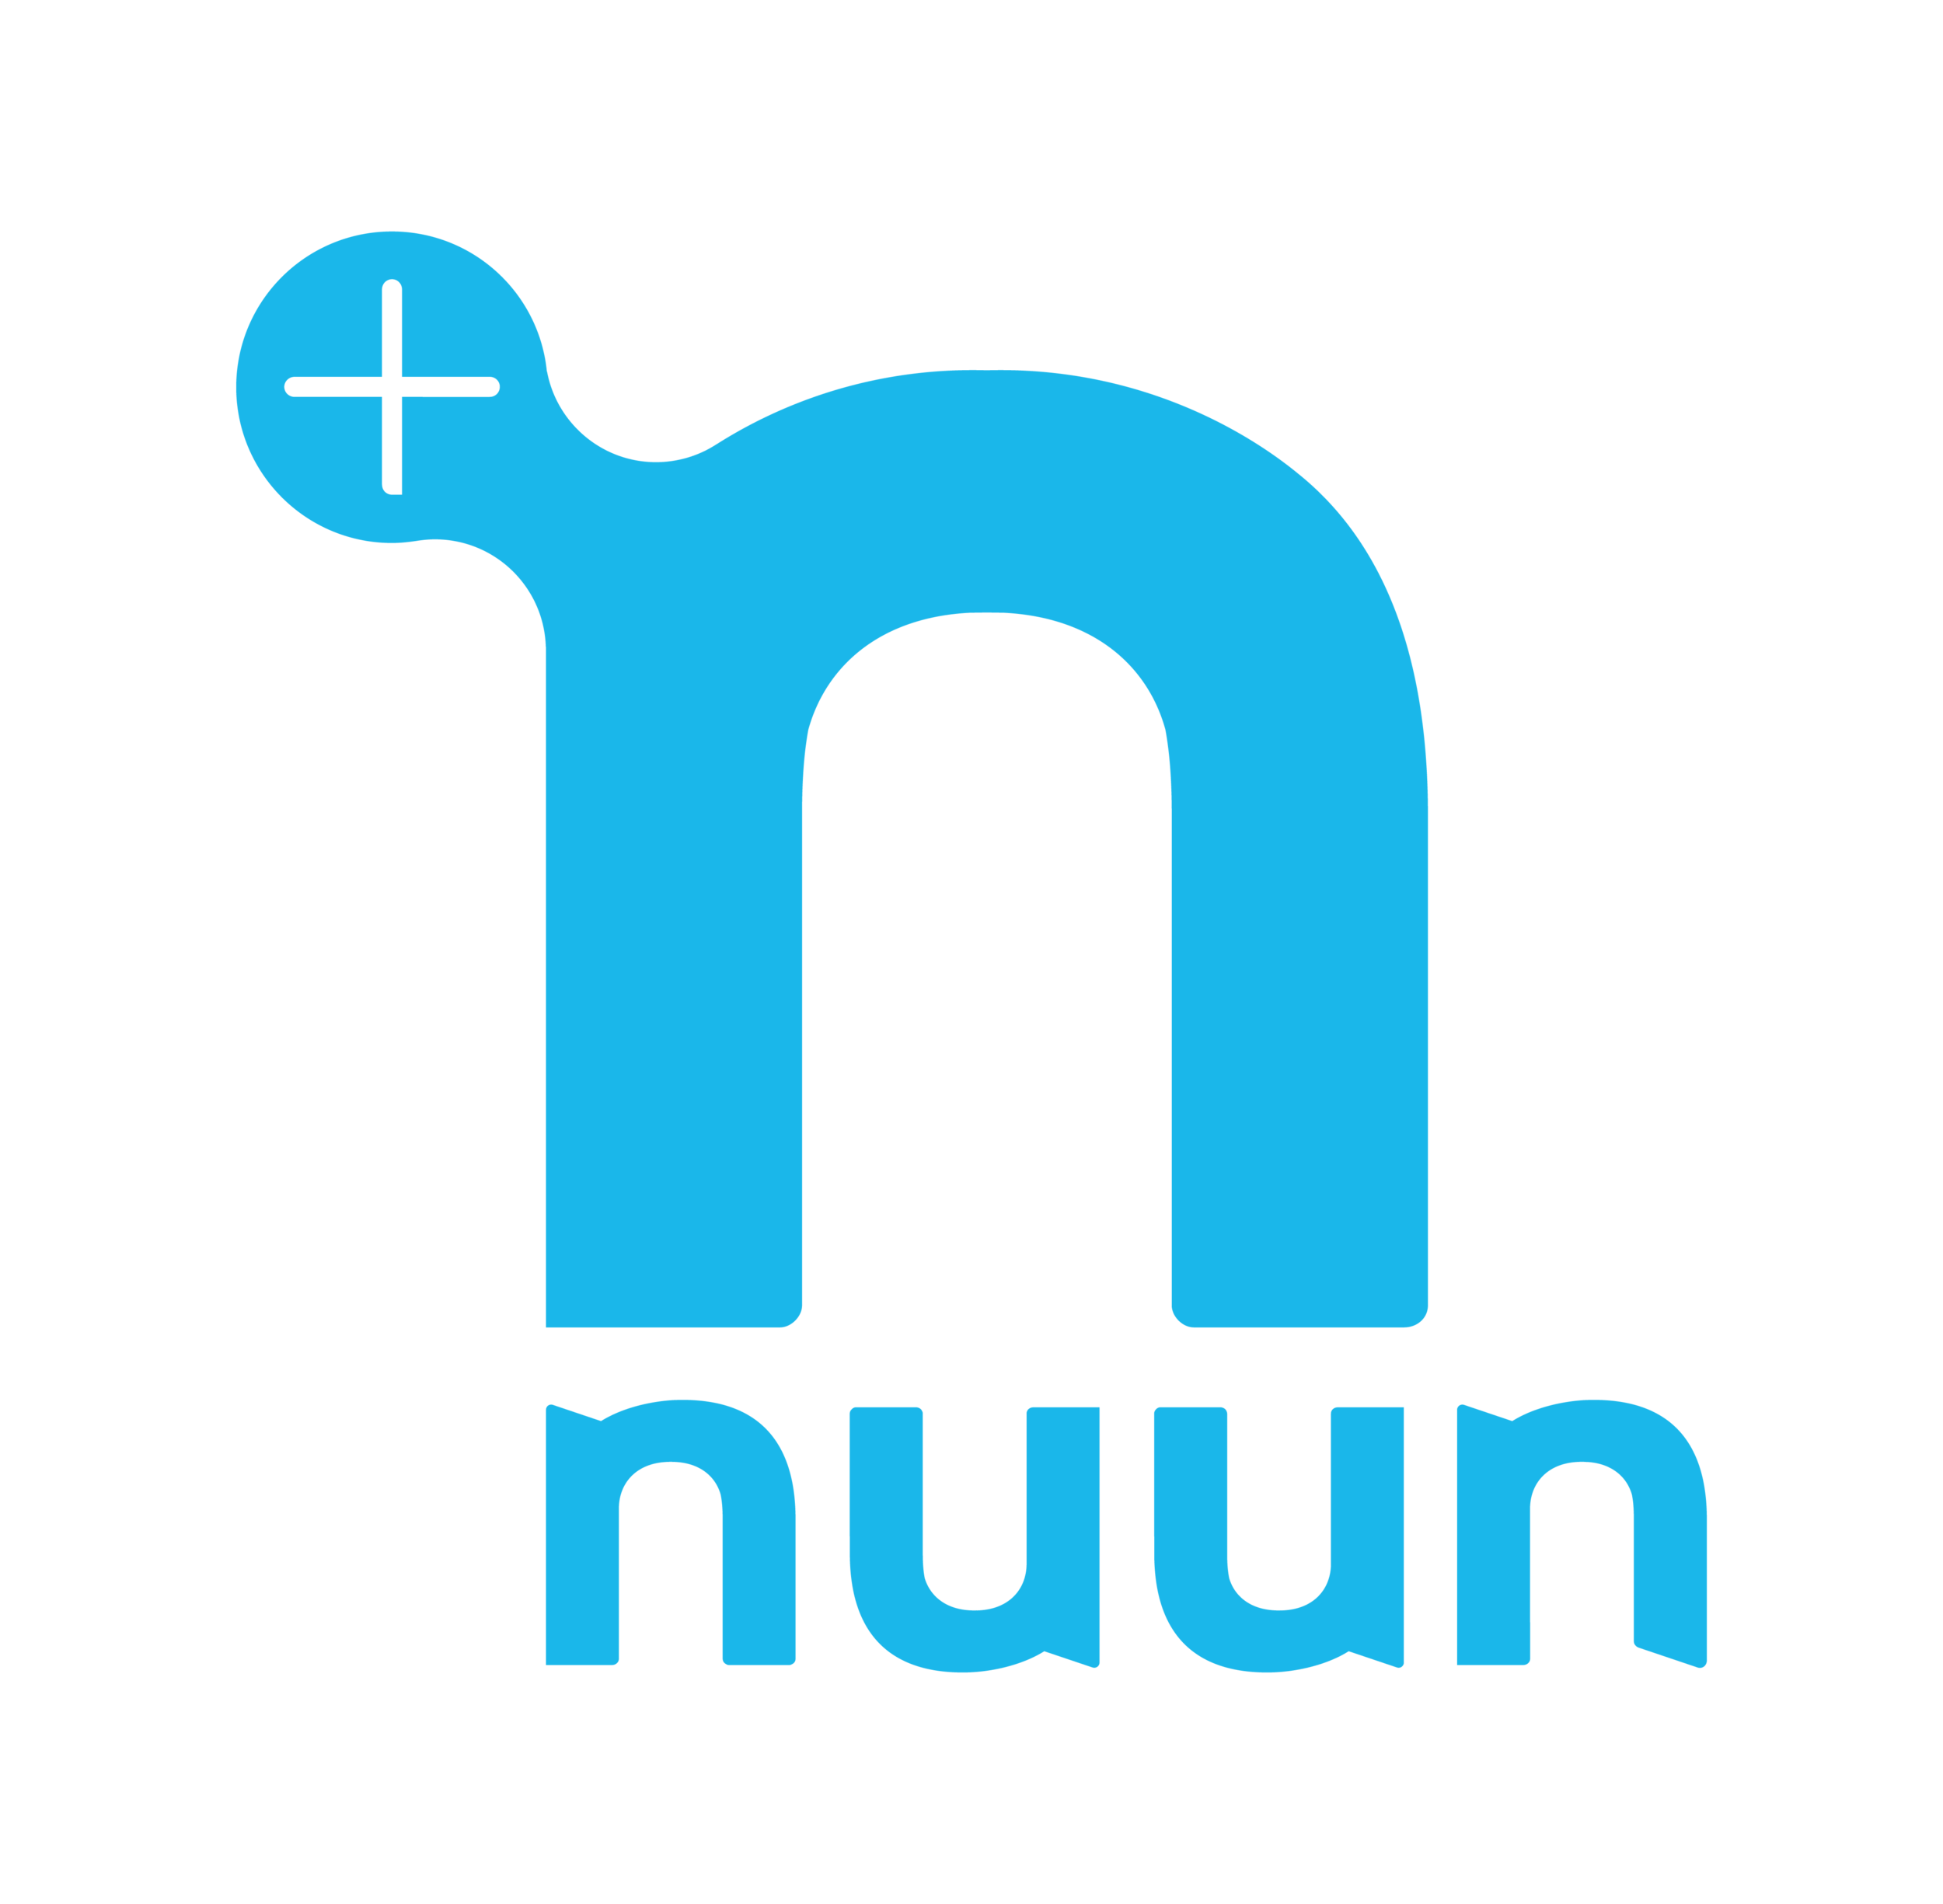 Image: the Nuun logo